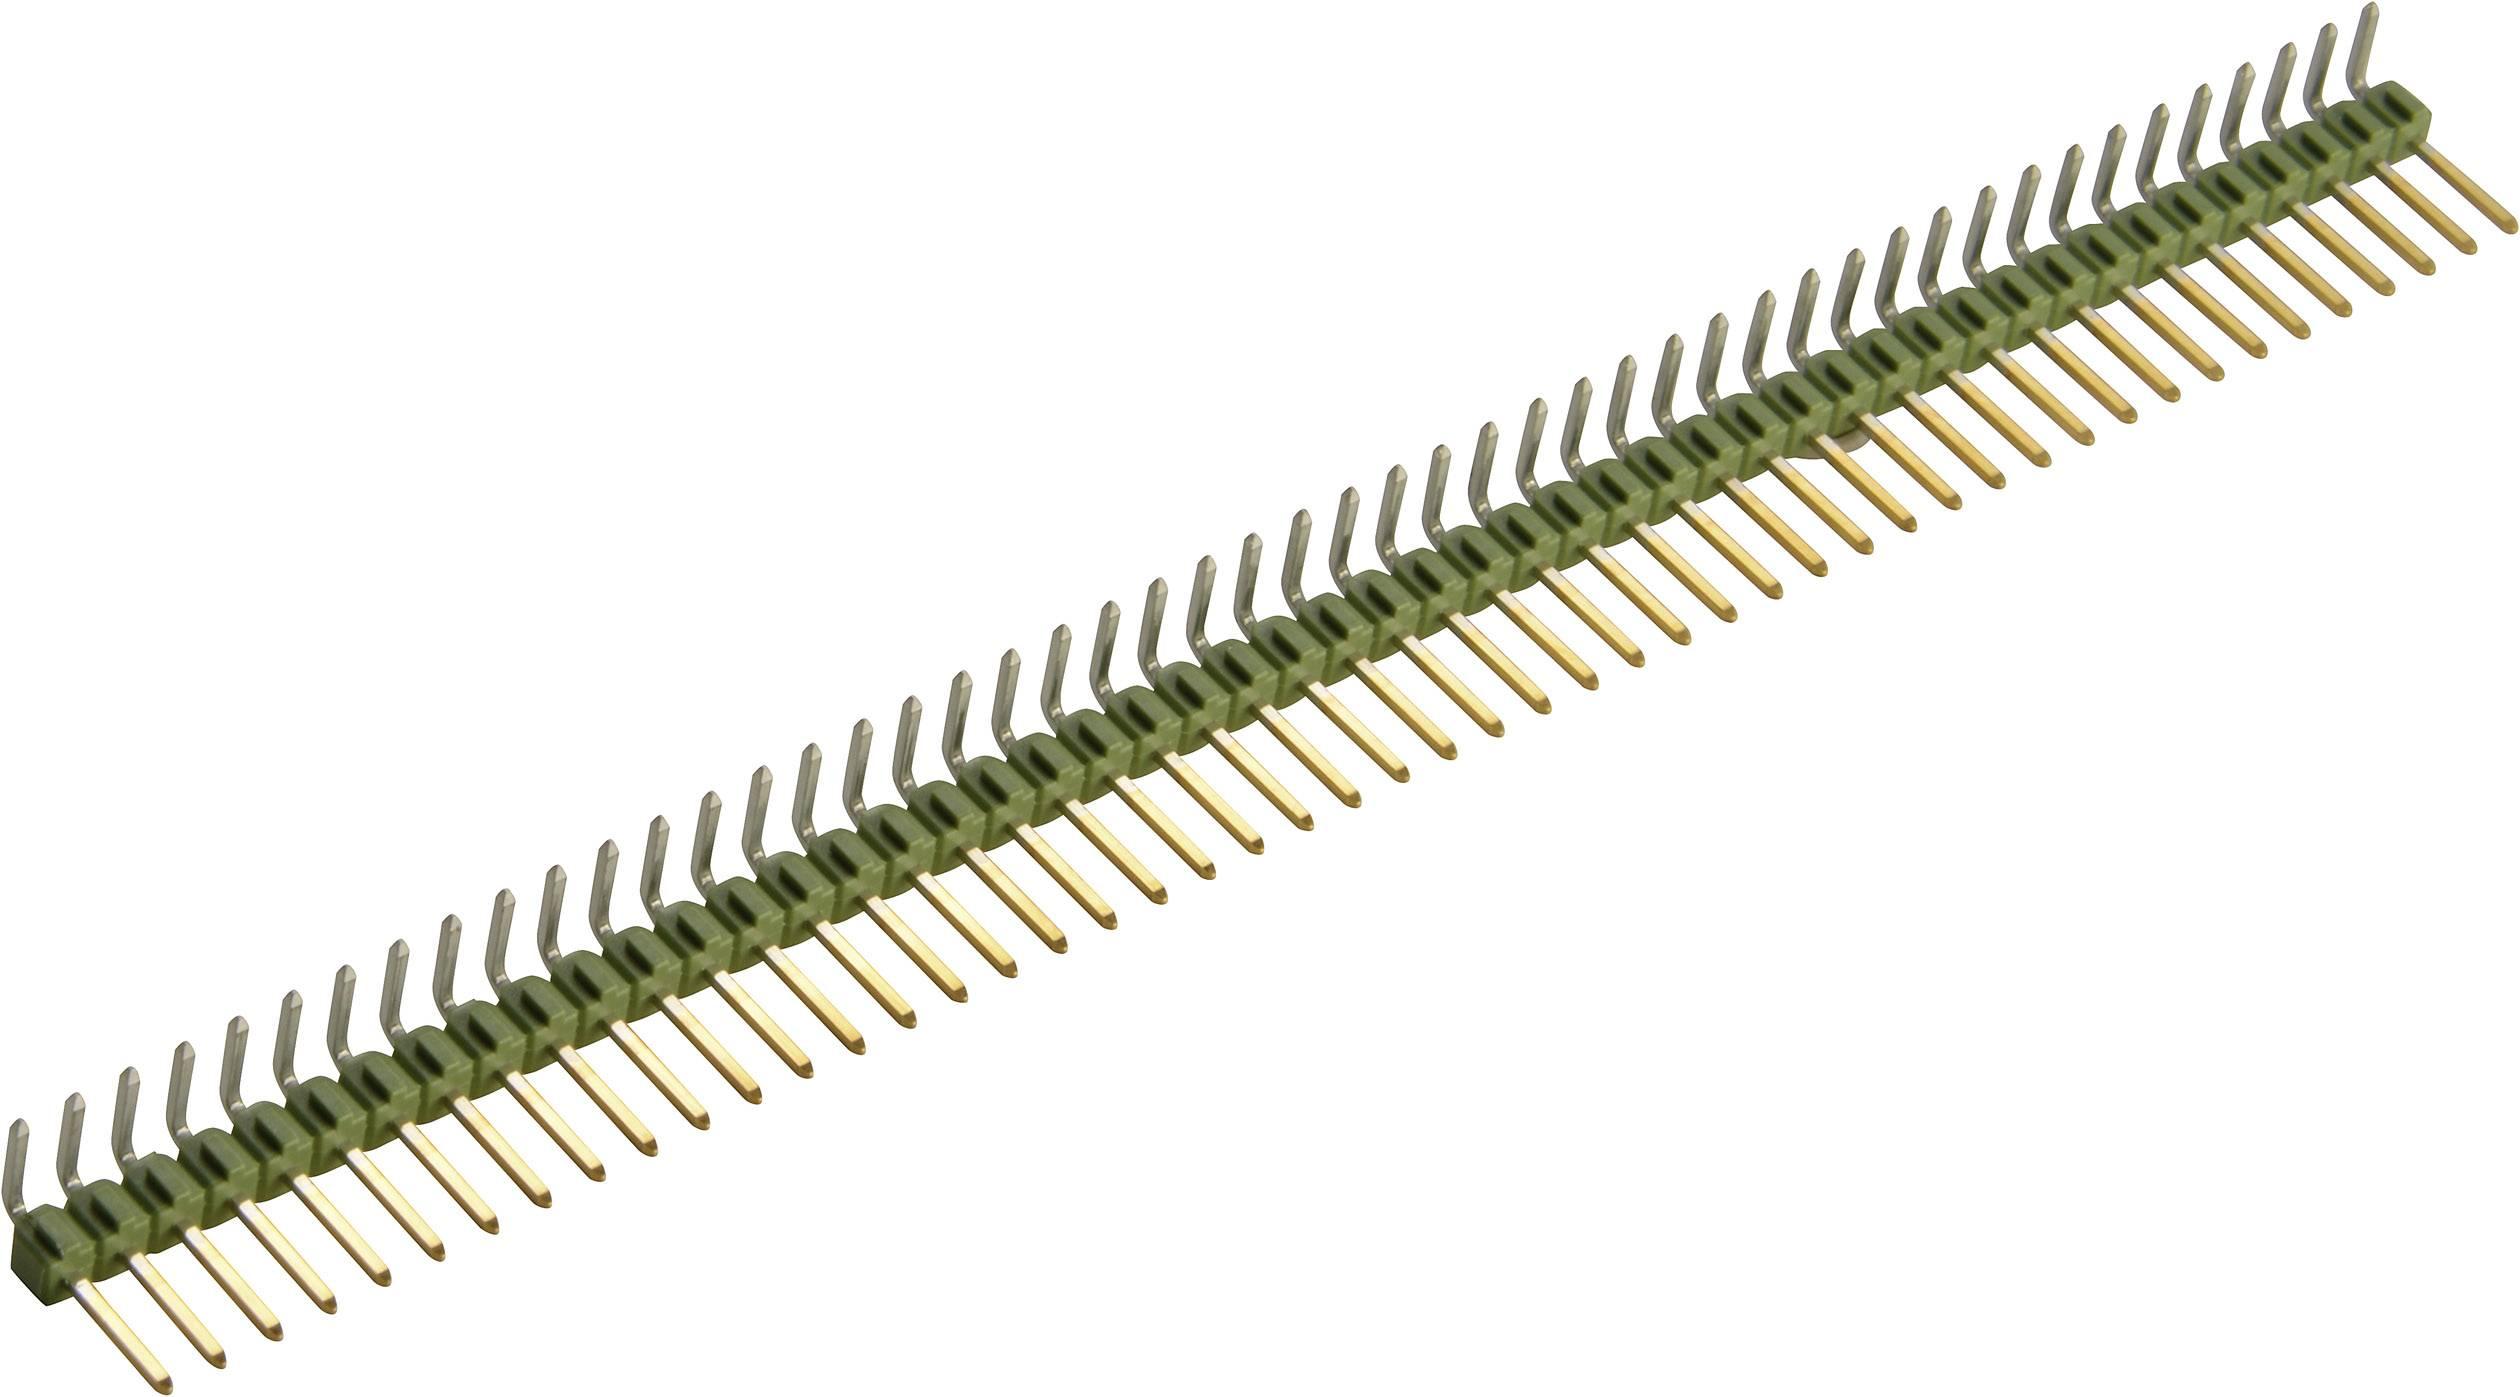 Pinová lišta (štandardná) TE Connectivity 5-826631-0, řádky 1, kontakty na řádek 50, 1 ks